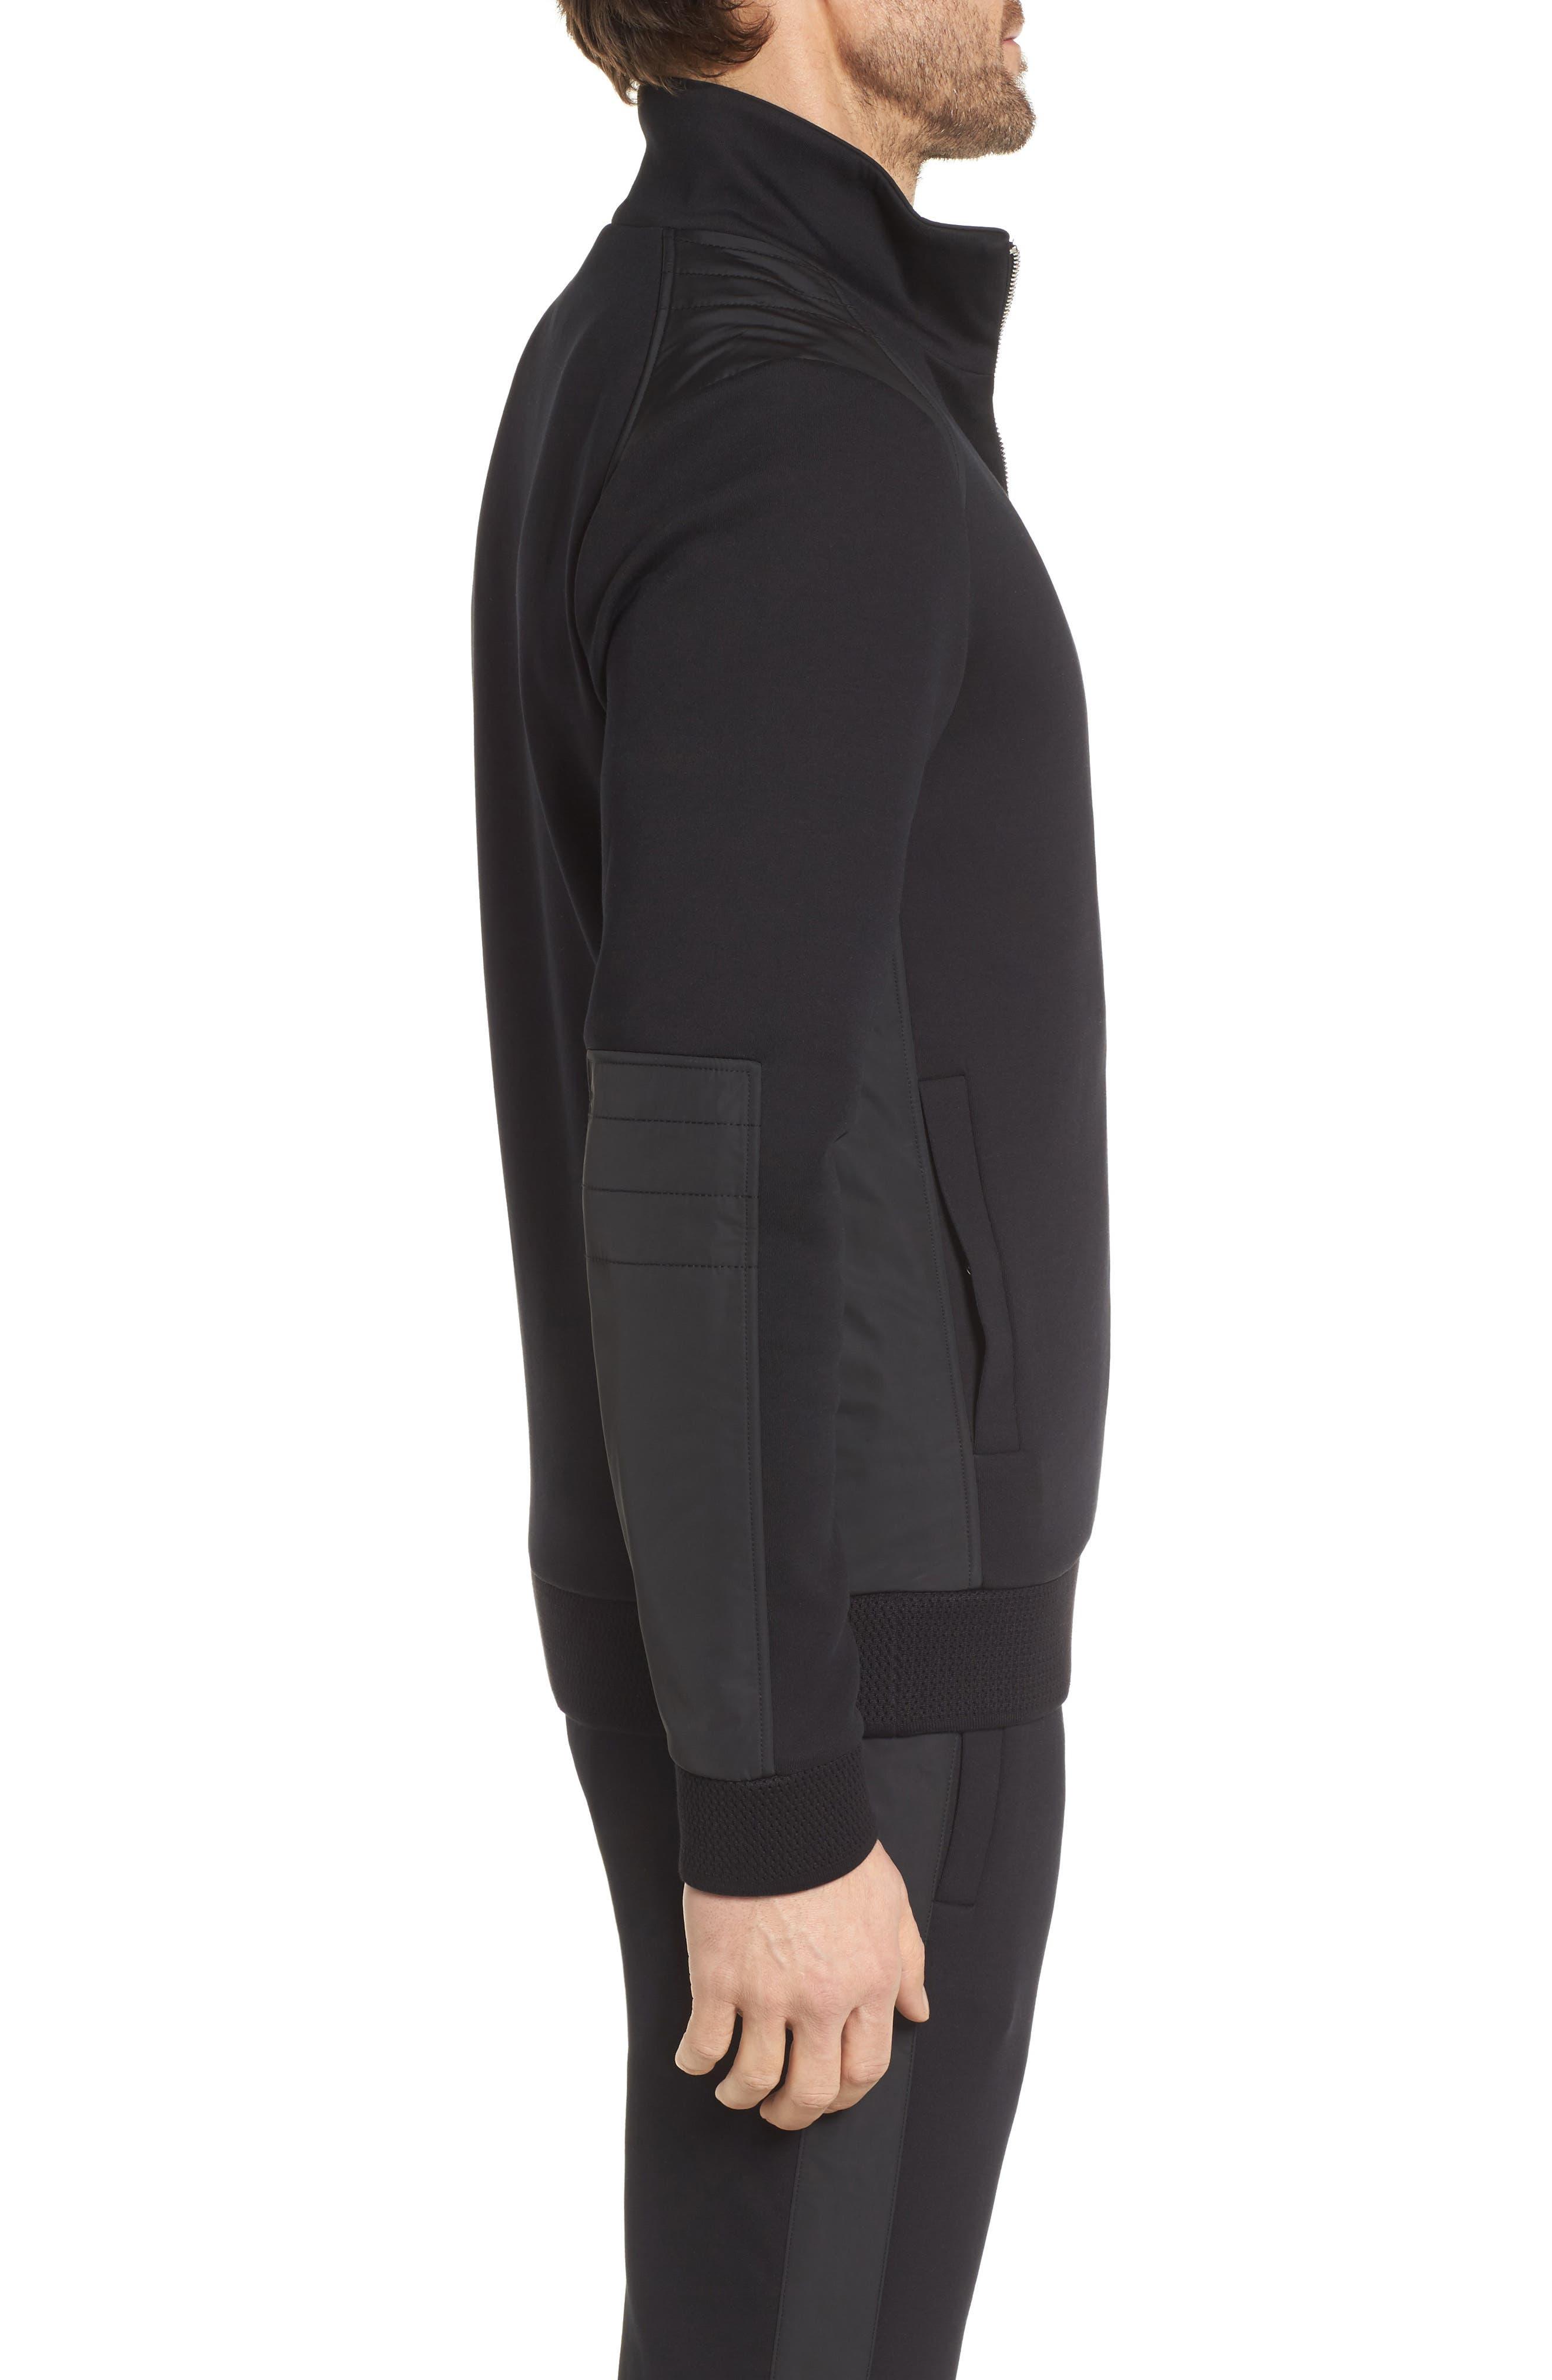 Soule Mercedes Slim Fit Zip Jacket,                             Alternate thumbnail 3, color,                             Black